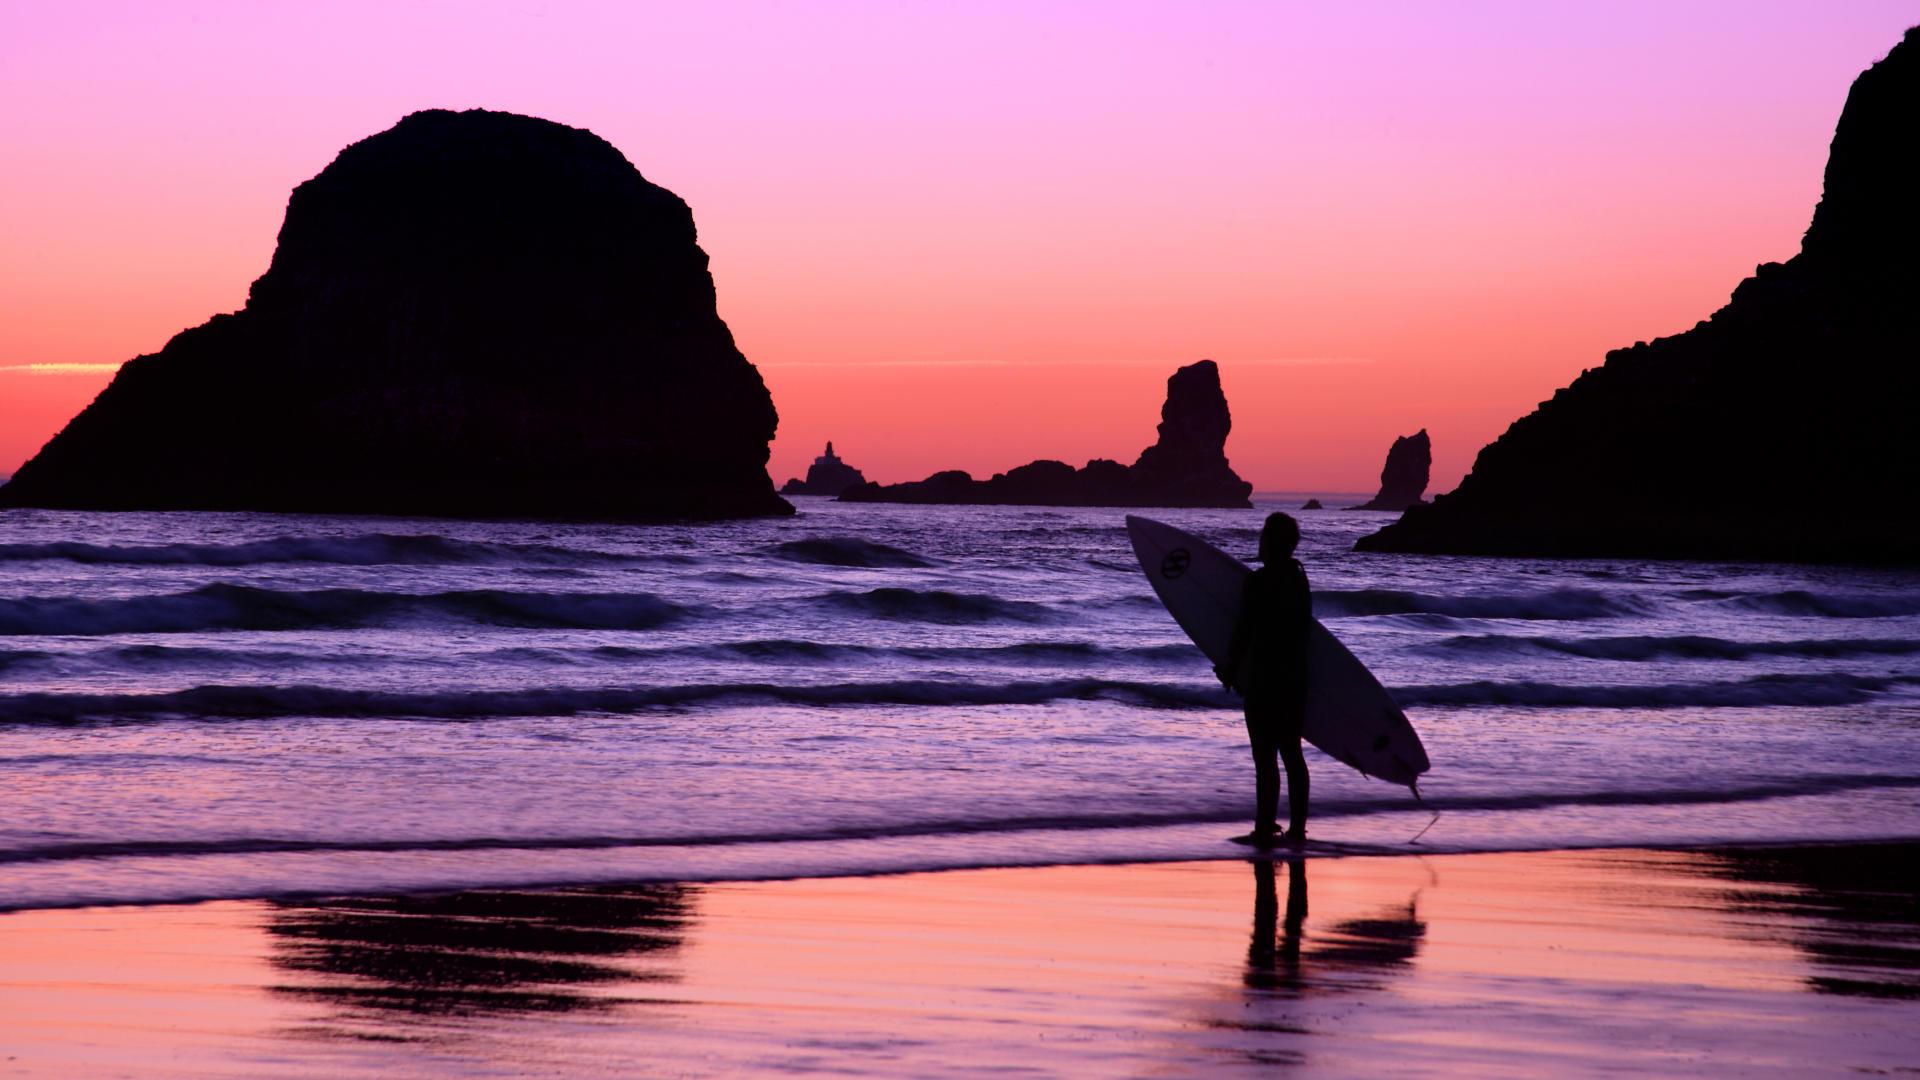 refletindo na praia papel - photo #30